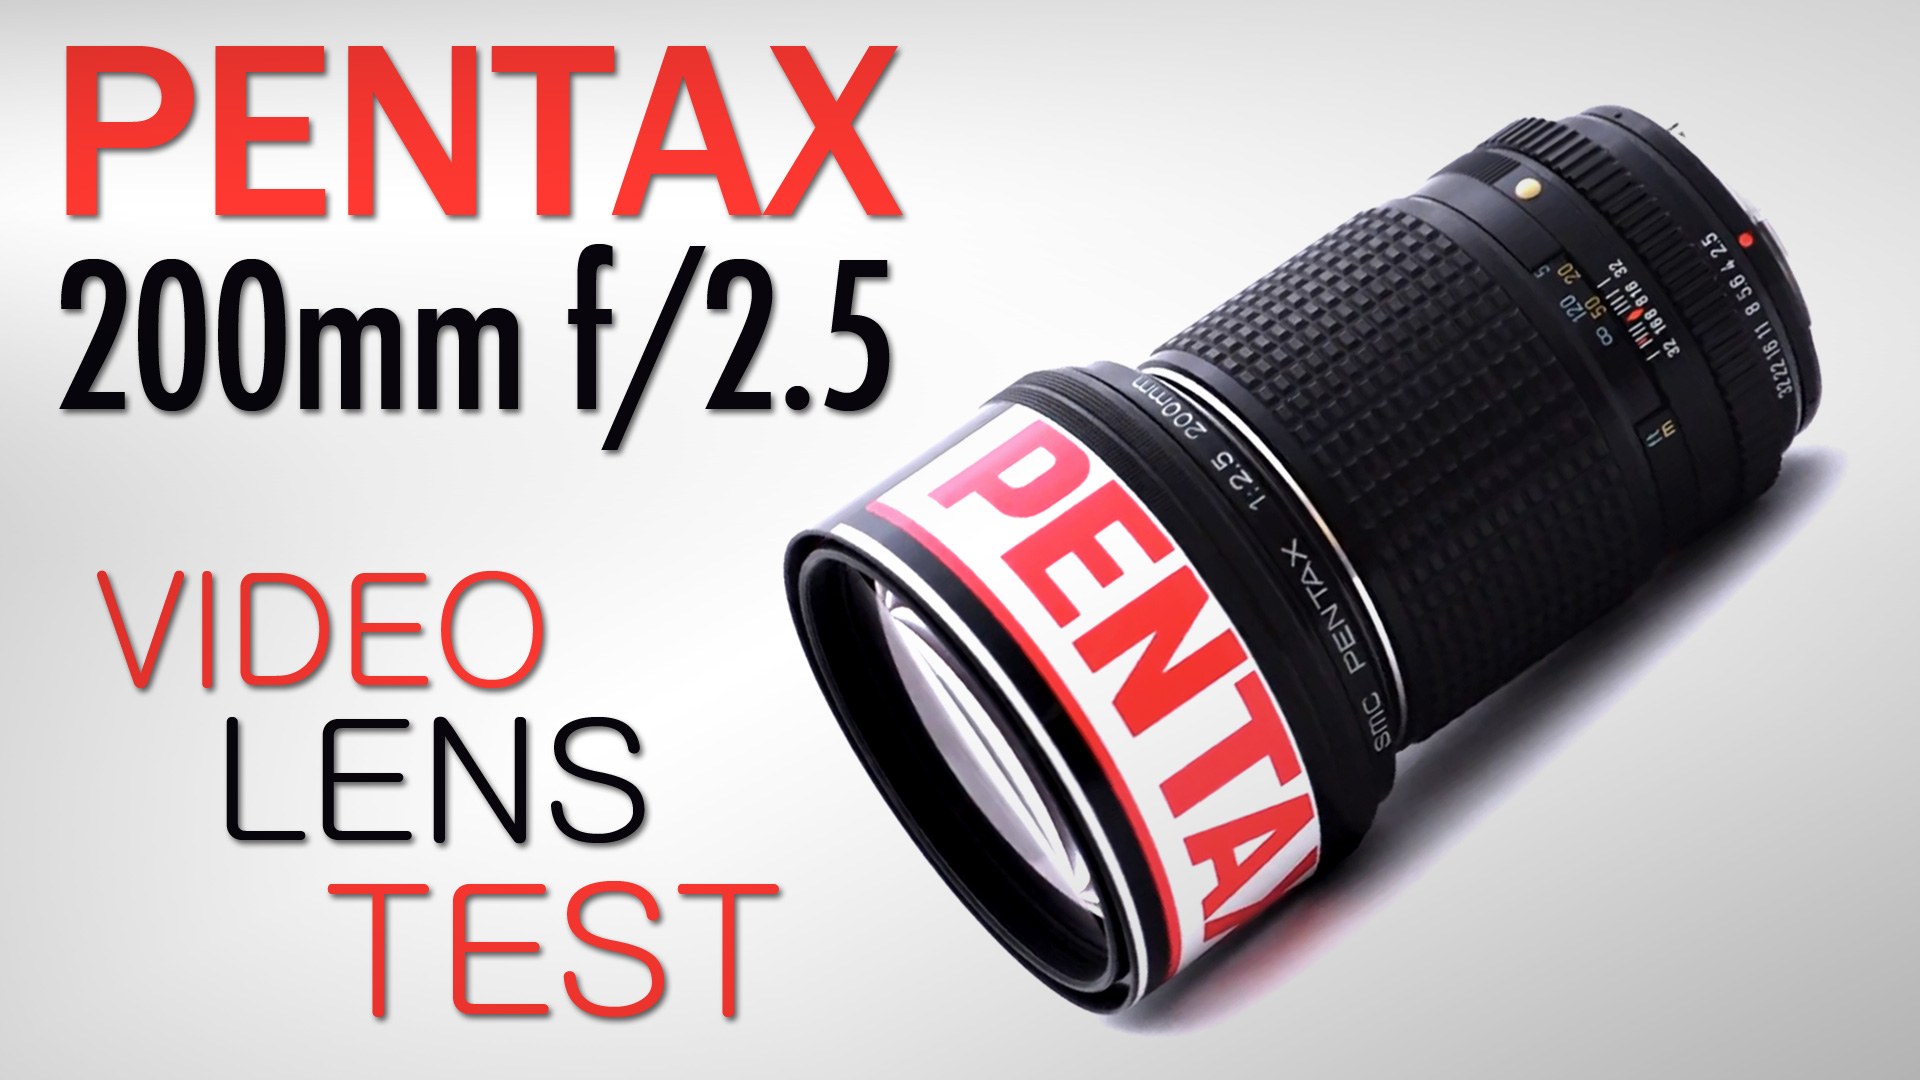 Pentax SMC 200mm f/2.5 Lens Test